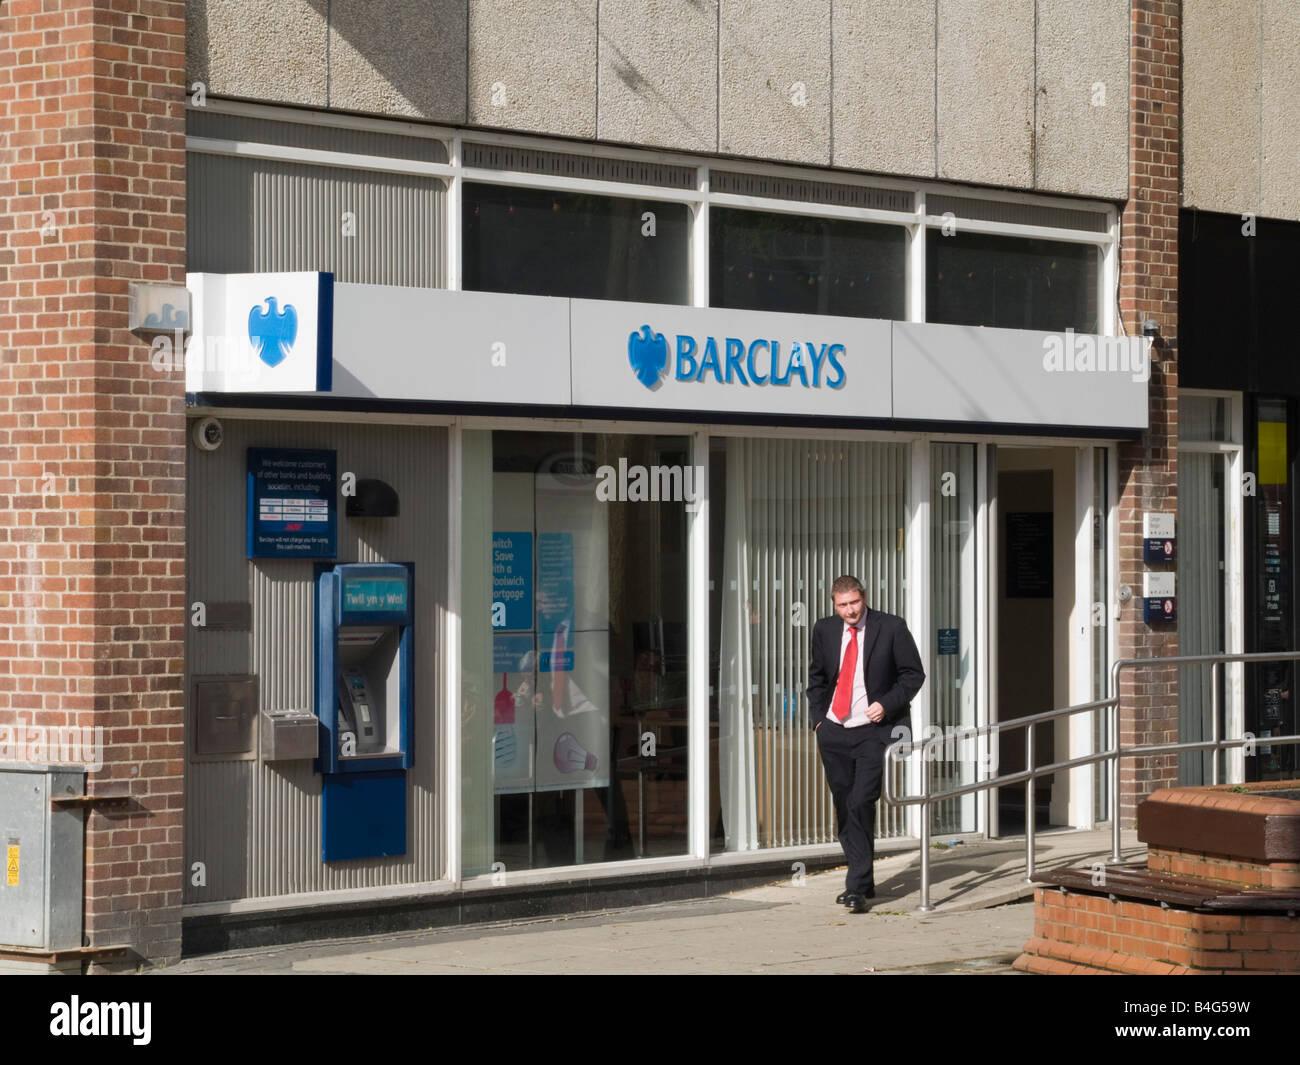 Barclays Bank High Street Ortsgruppe Stadt Bangor, Wales, UK, Großbritannien Stockbild